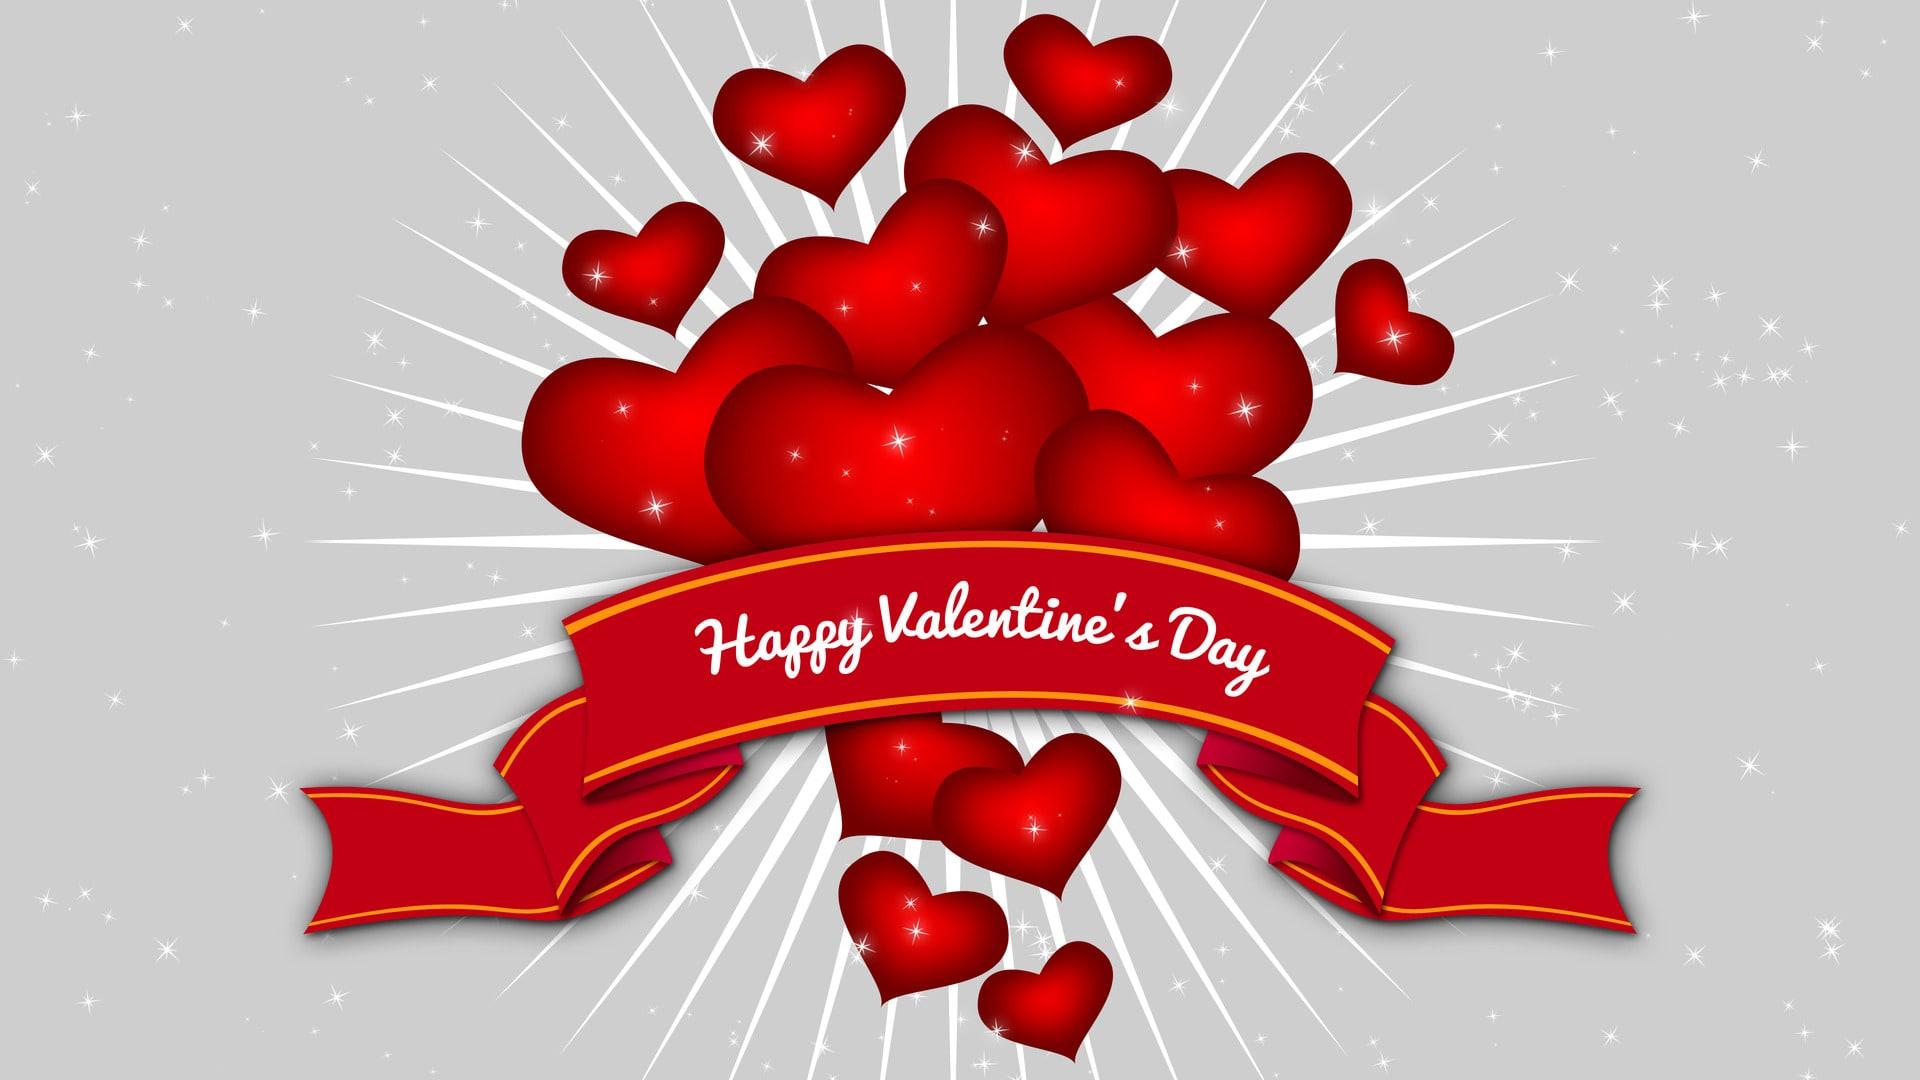 Valentine's Day Quality desktop